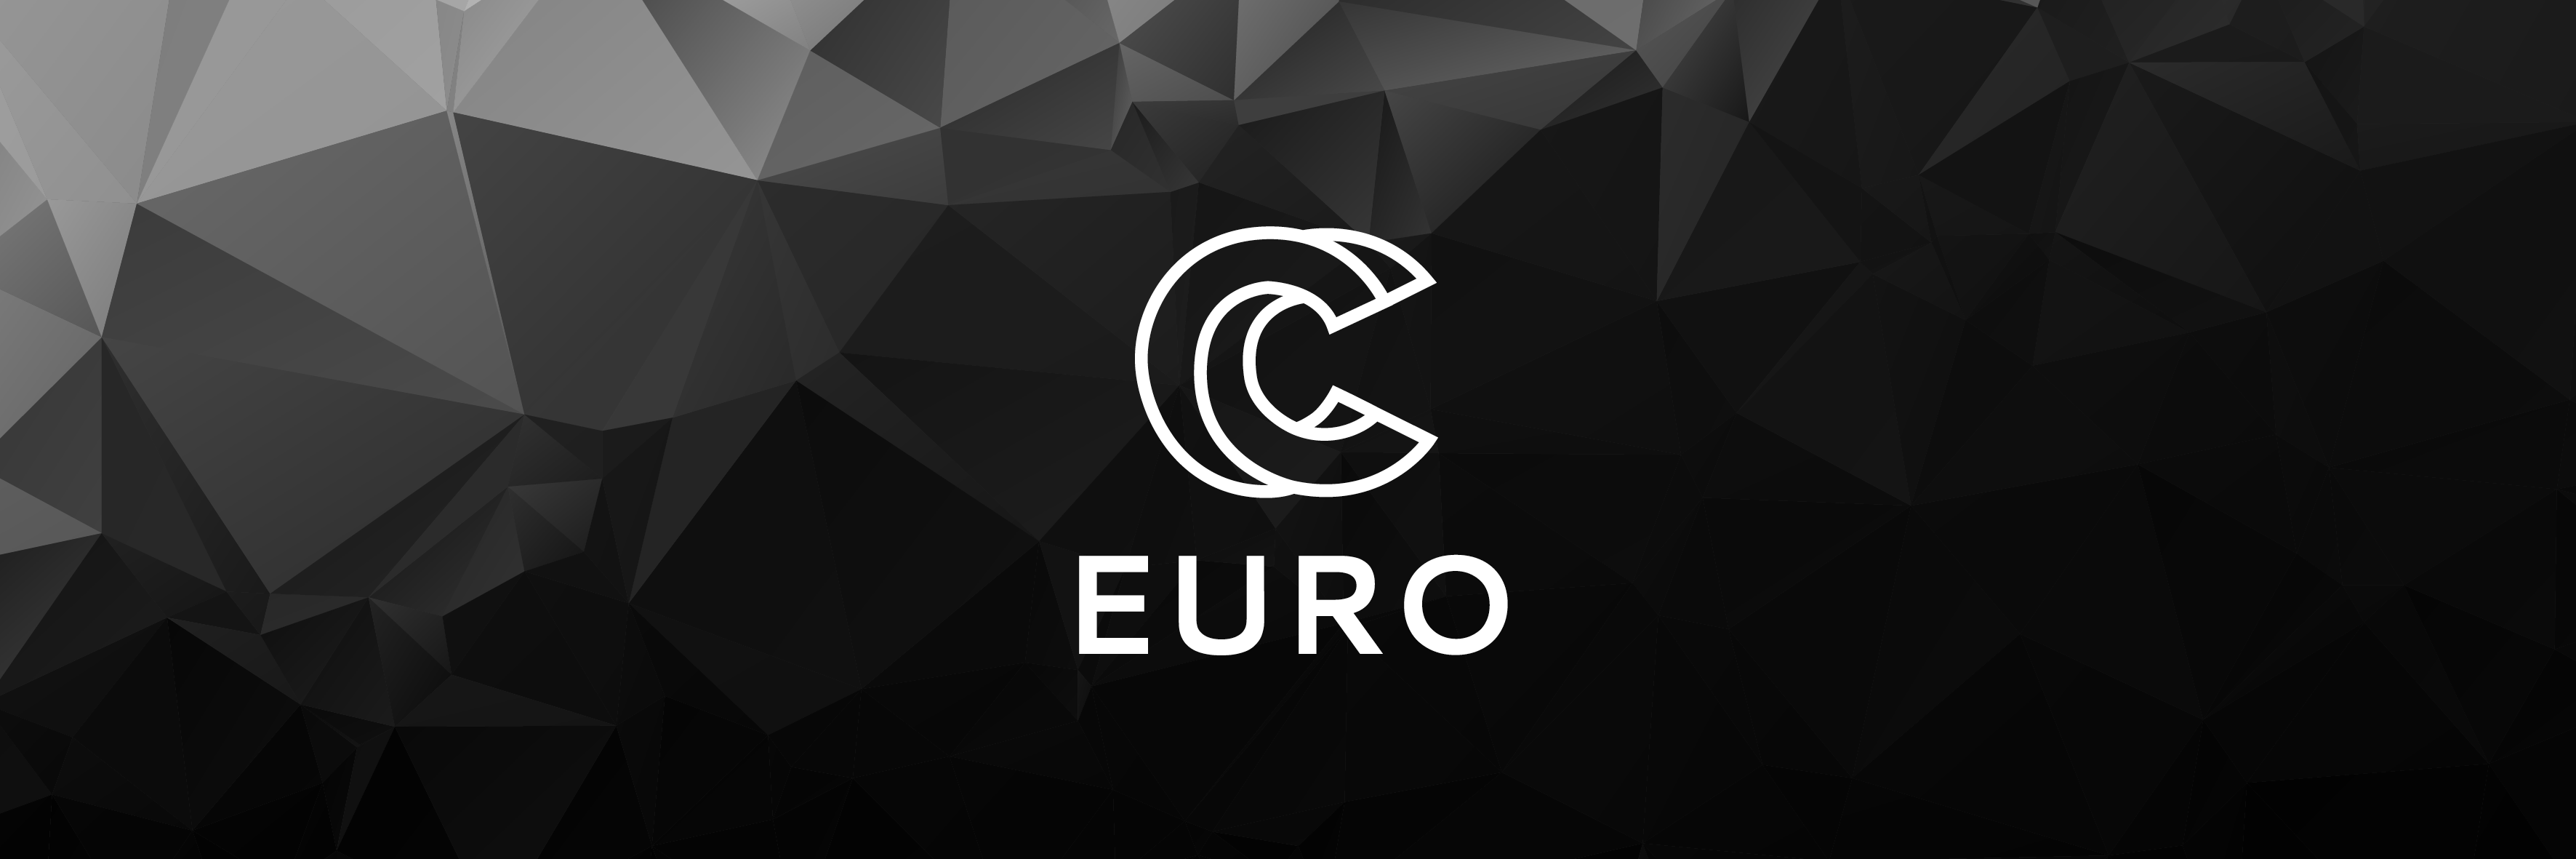 EUROCC Newsletter